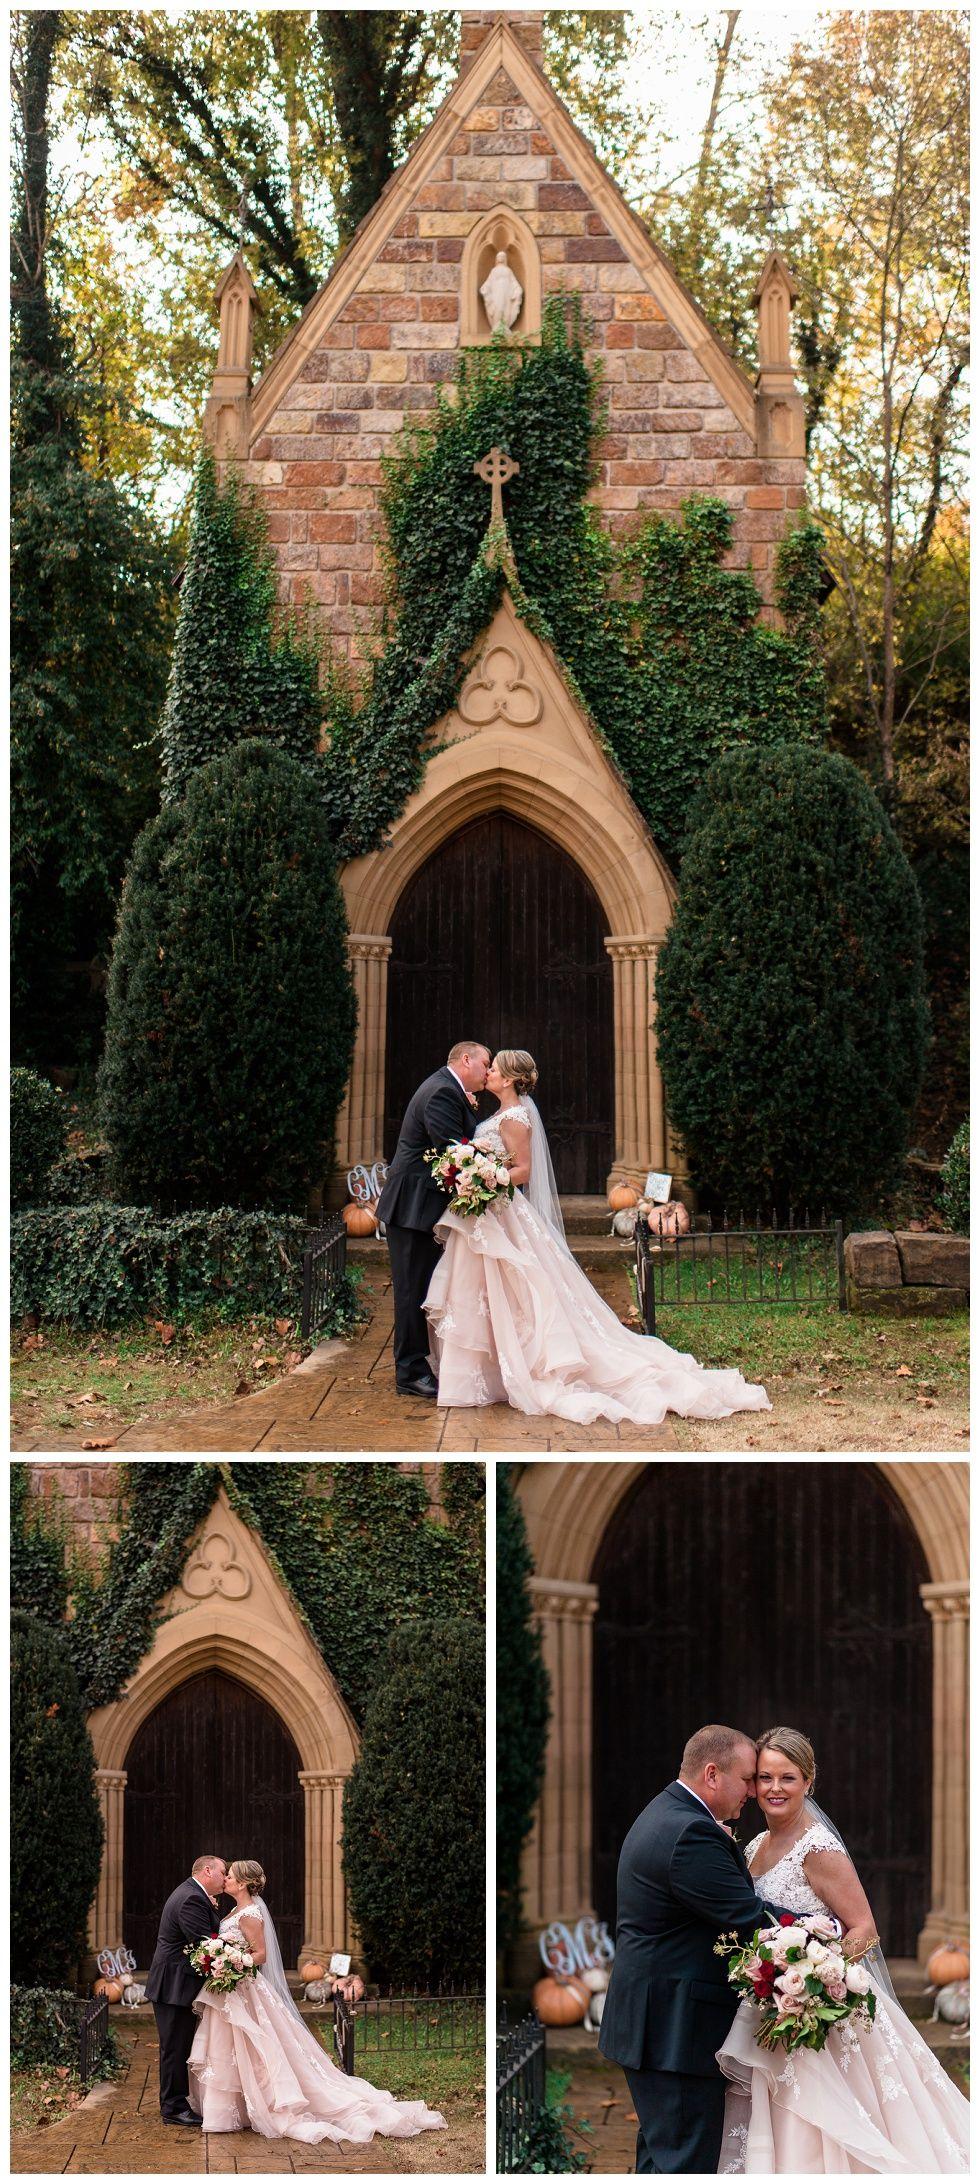 Jennifer + Chris   Arkansas wedding venues, Arkansas ...